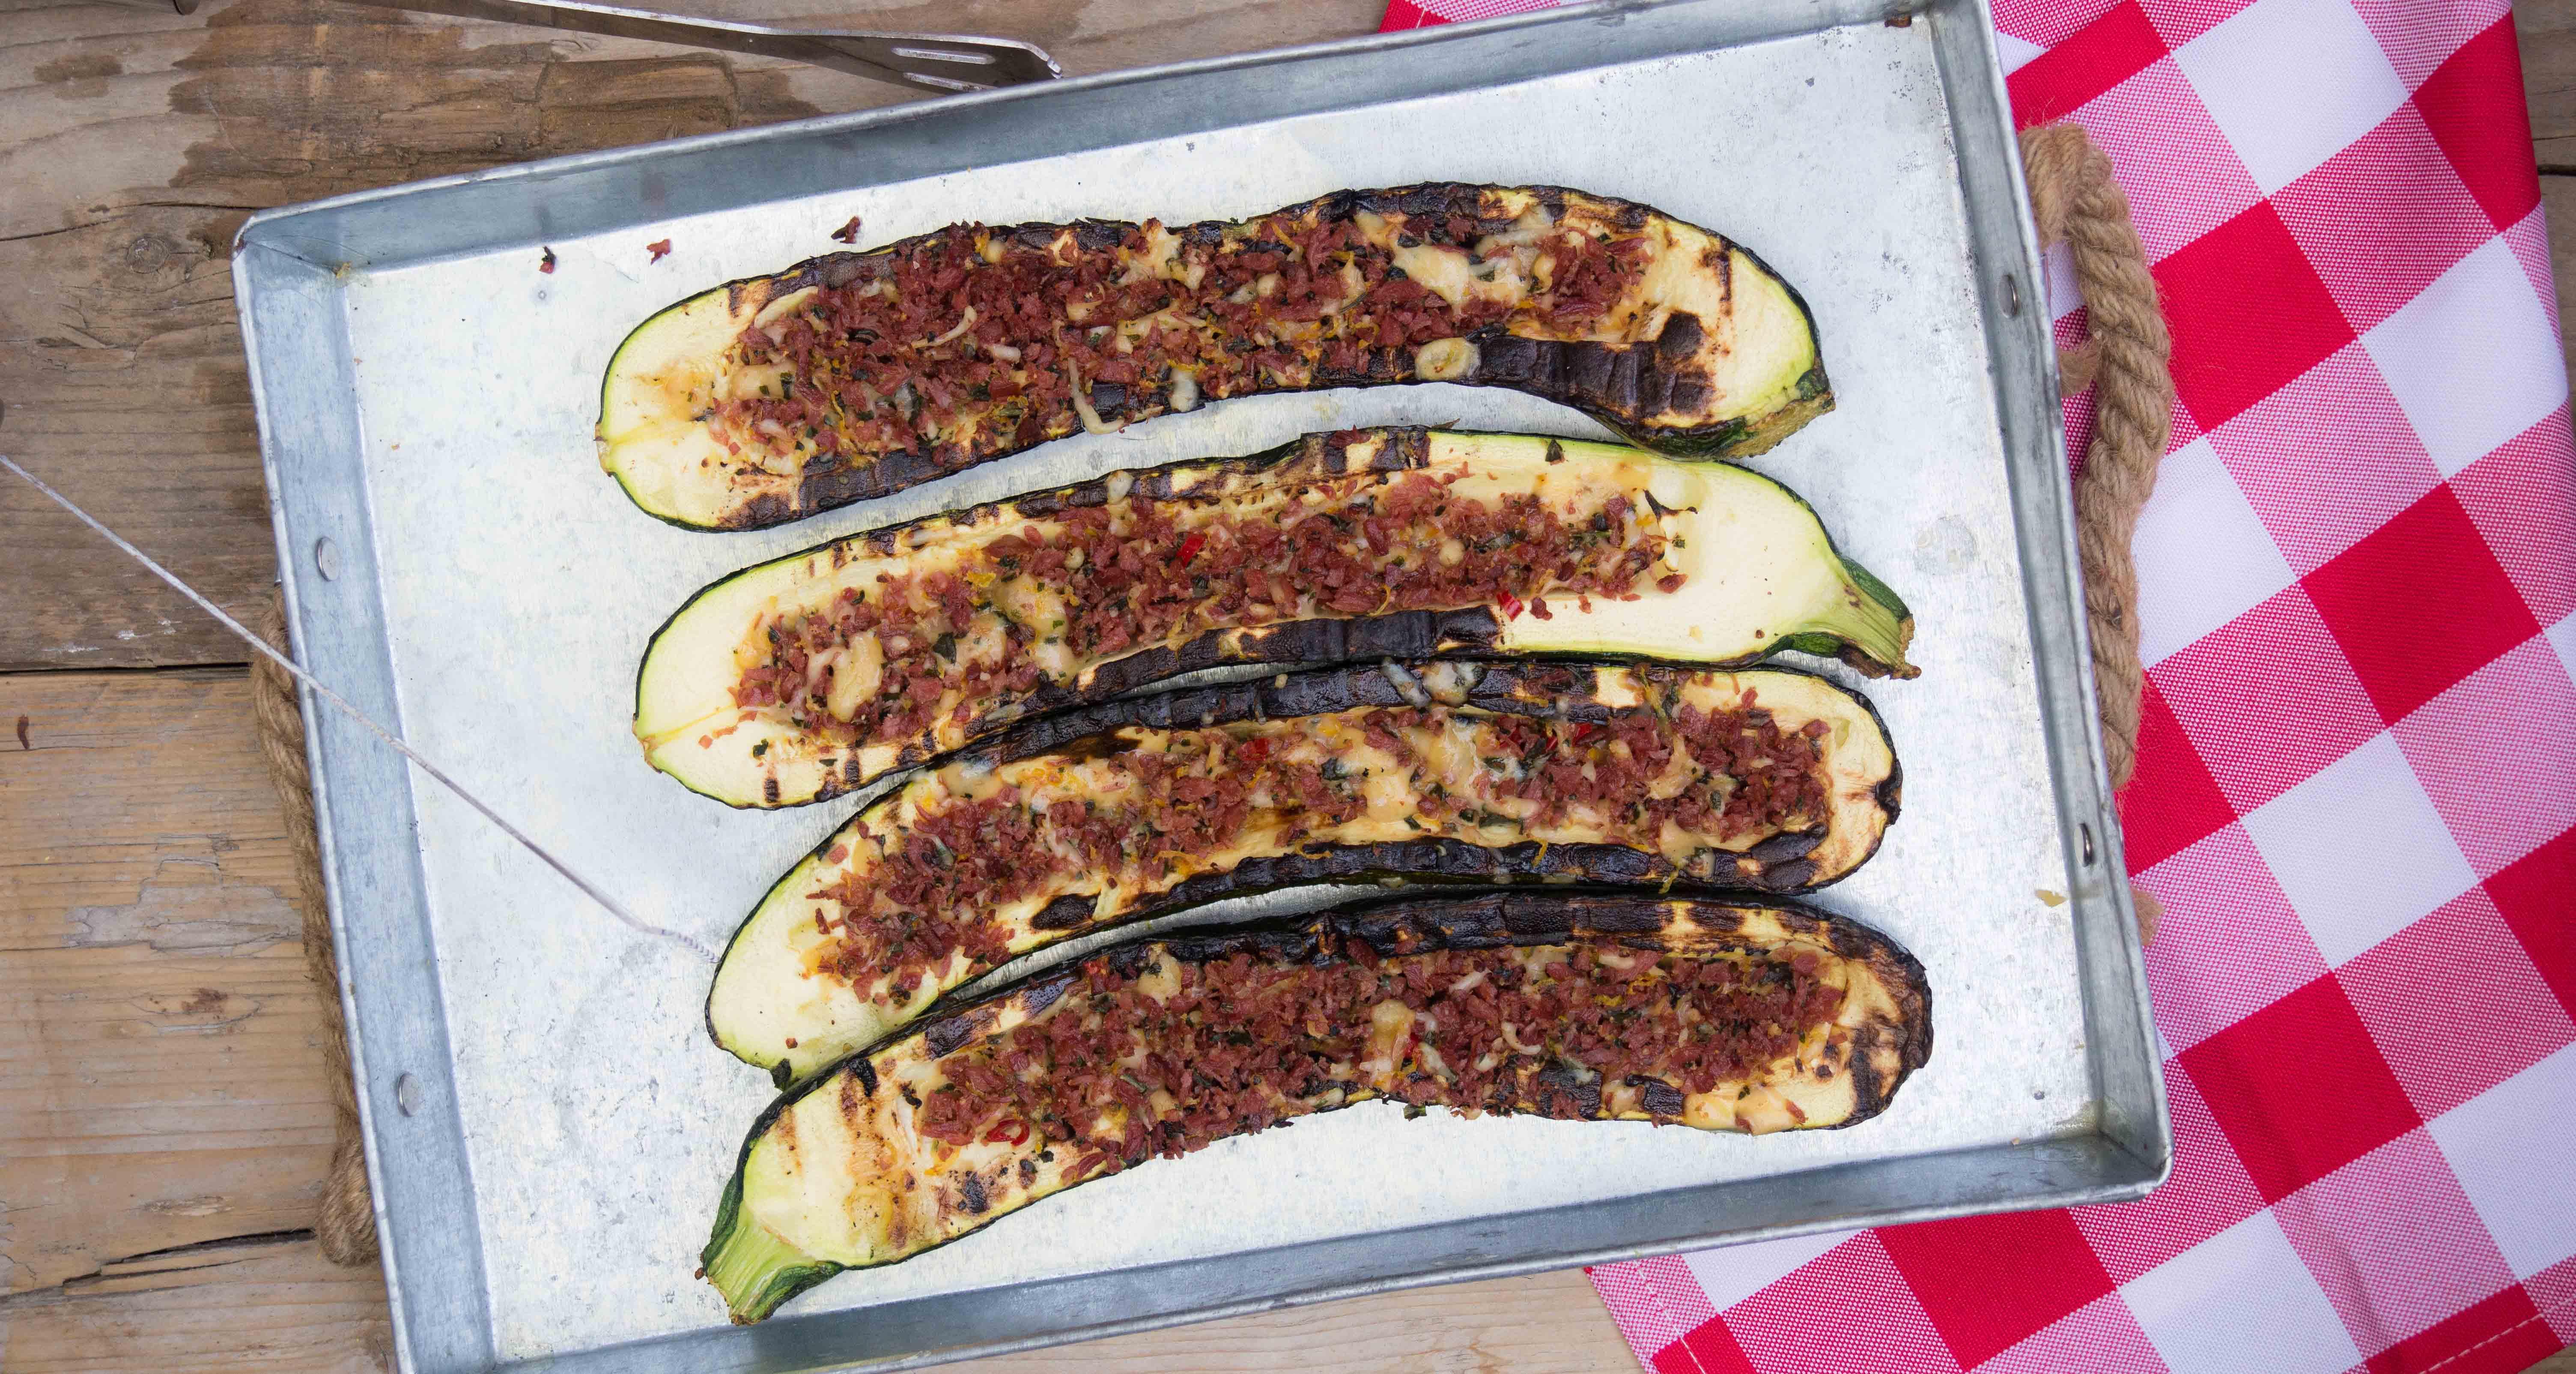 courgettes met bacon gremolata, bbq, Julius Jaspers, groente